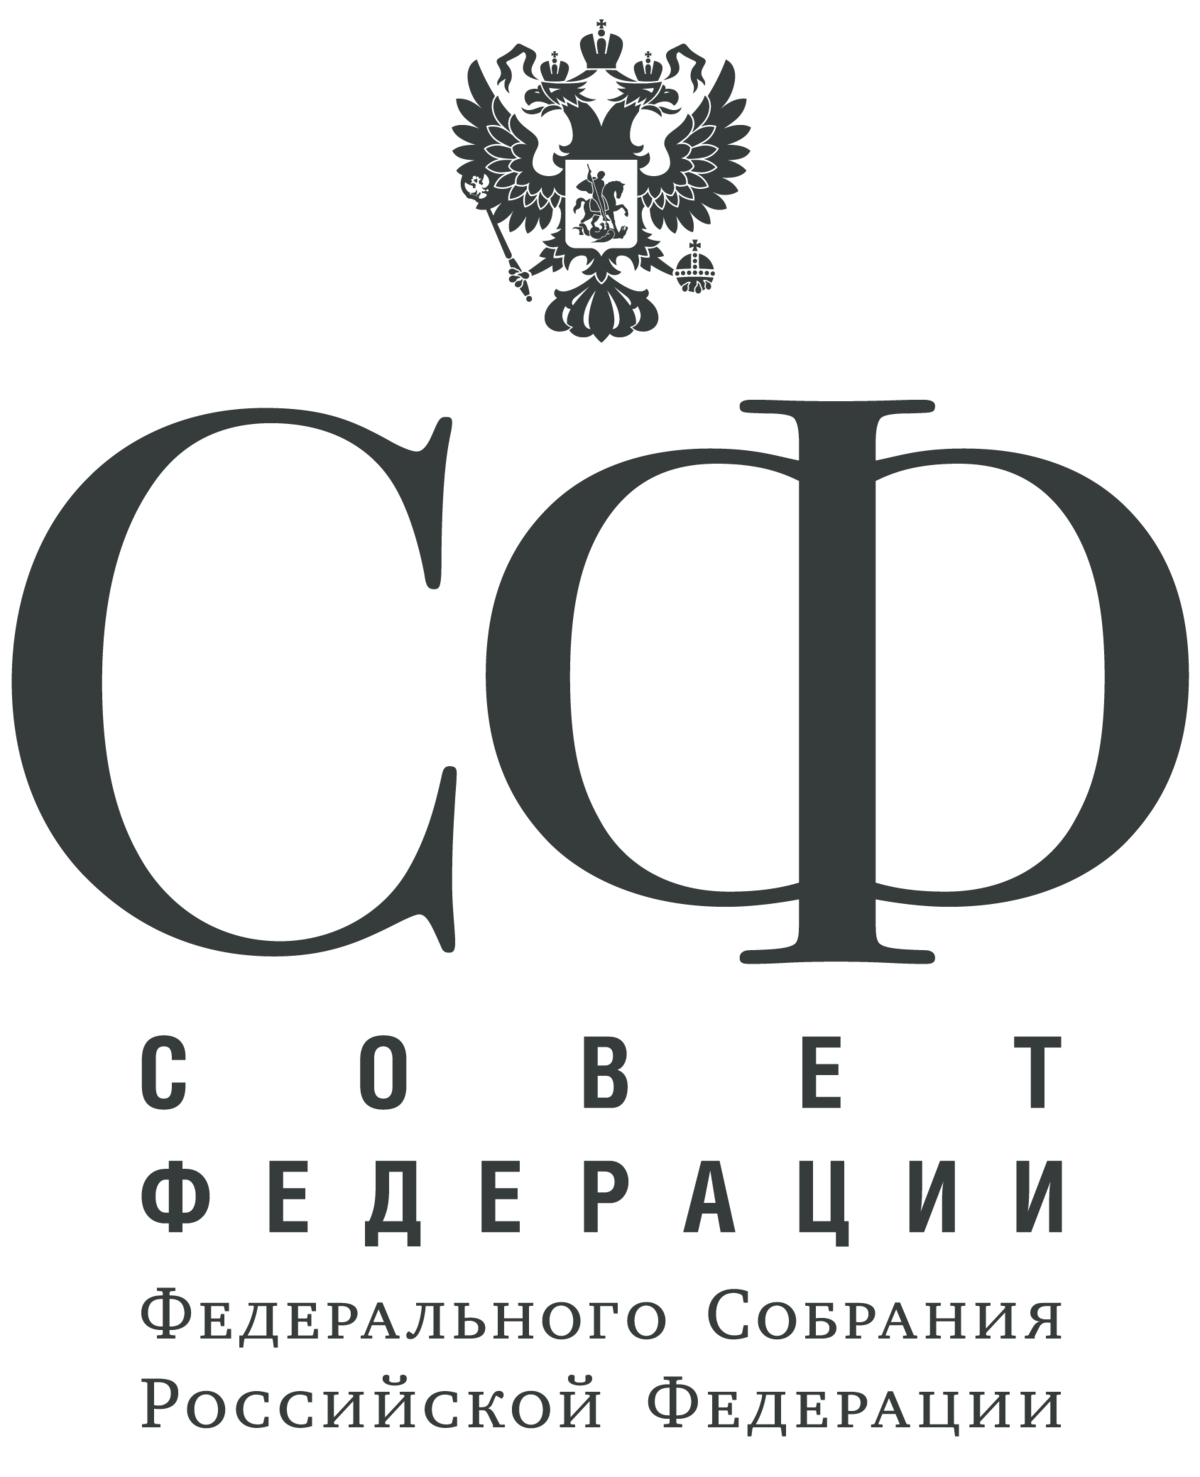 Federation council russia wikipedia. Congress clipart federal